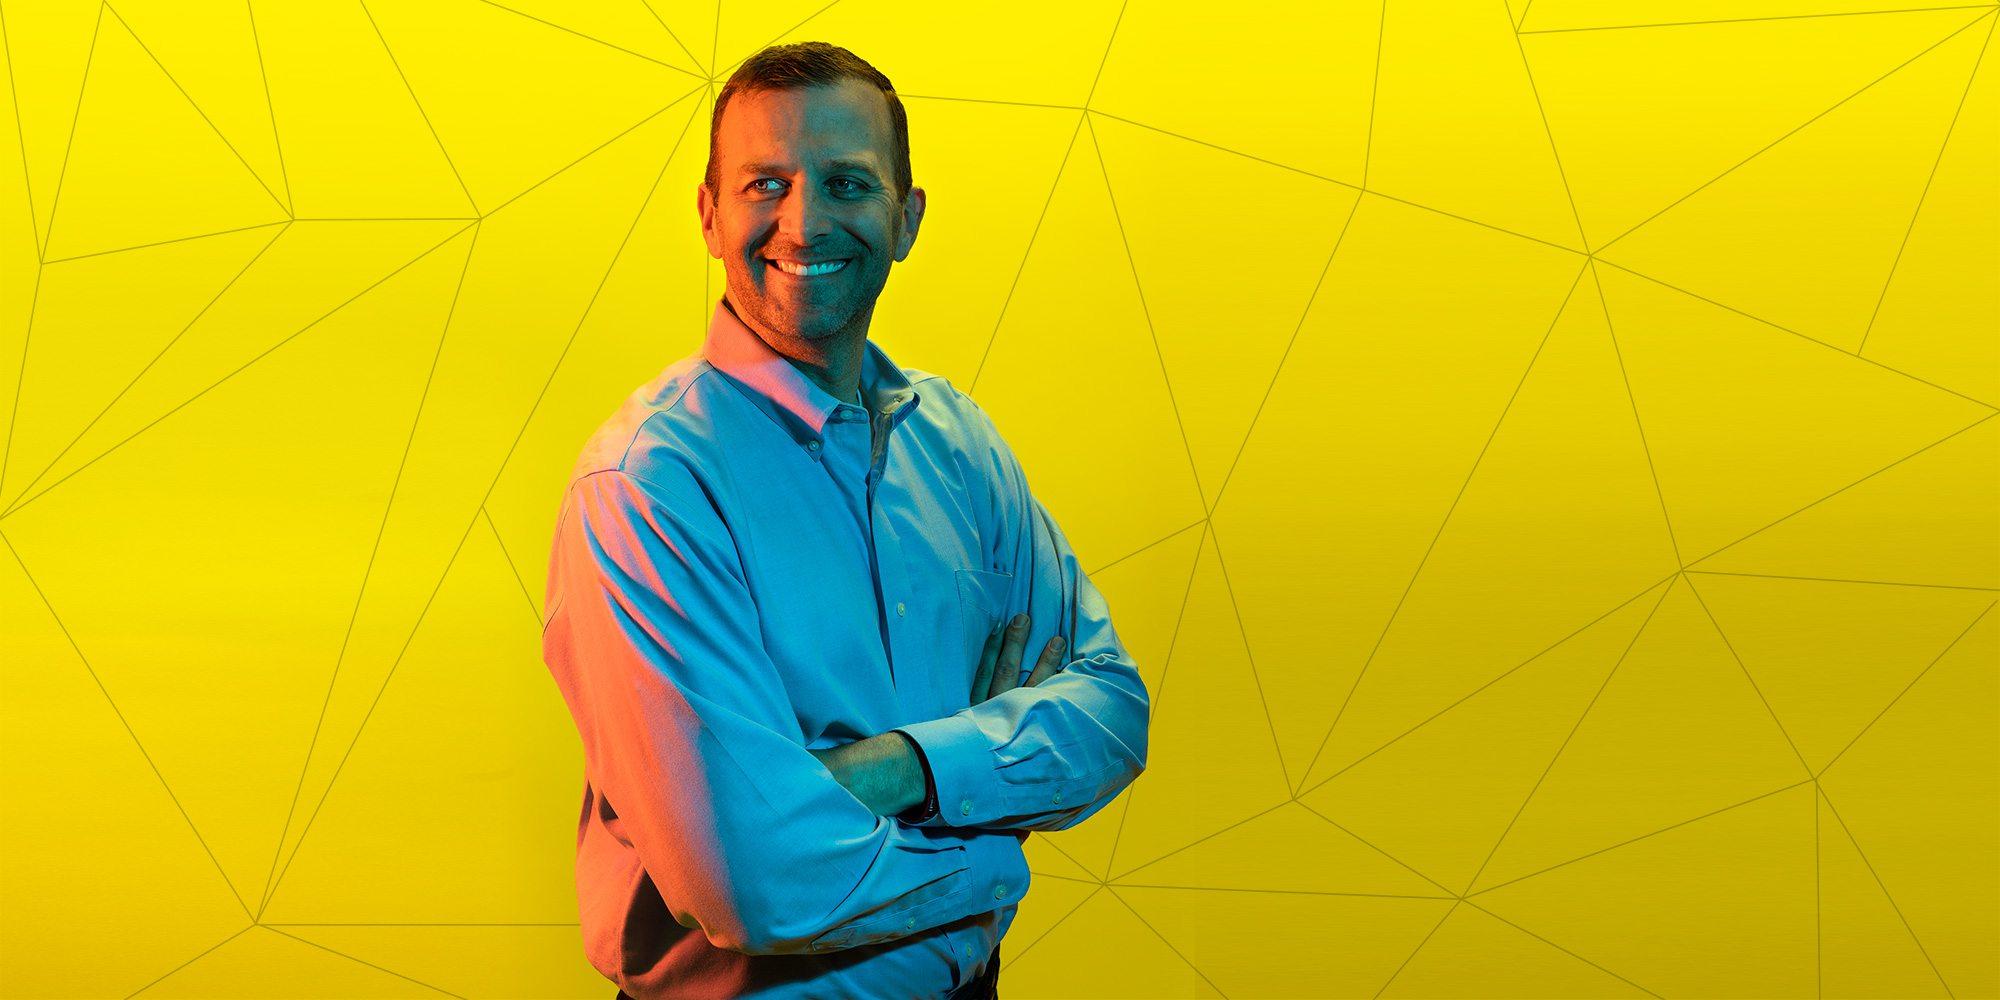 Dr. Joshua M. Davis of Missouri State University in Springfield MO